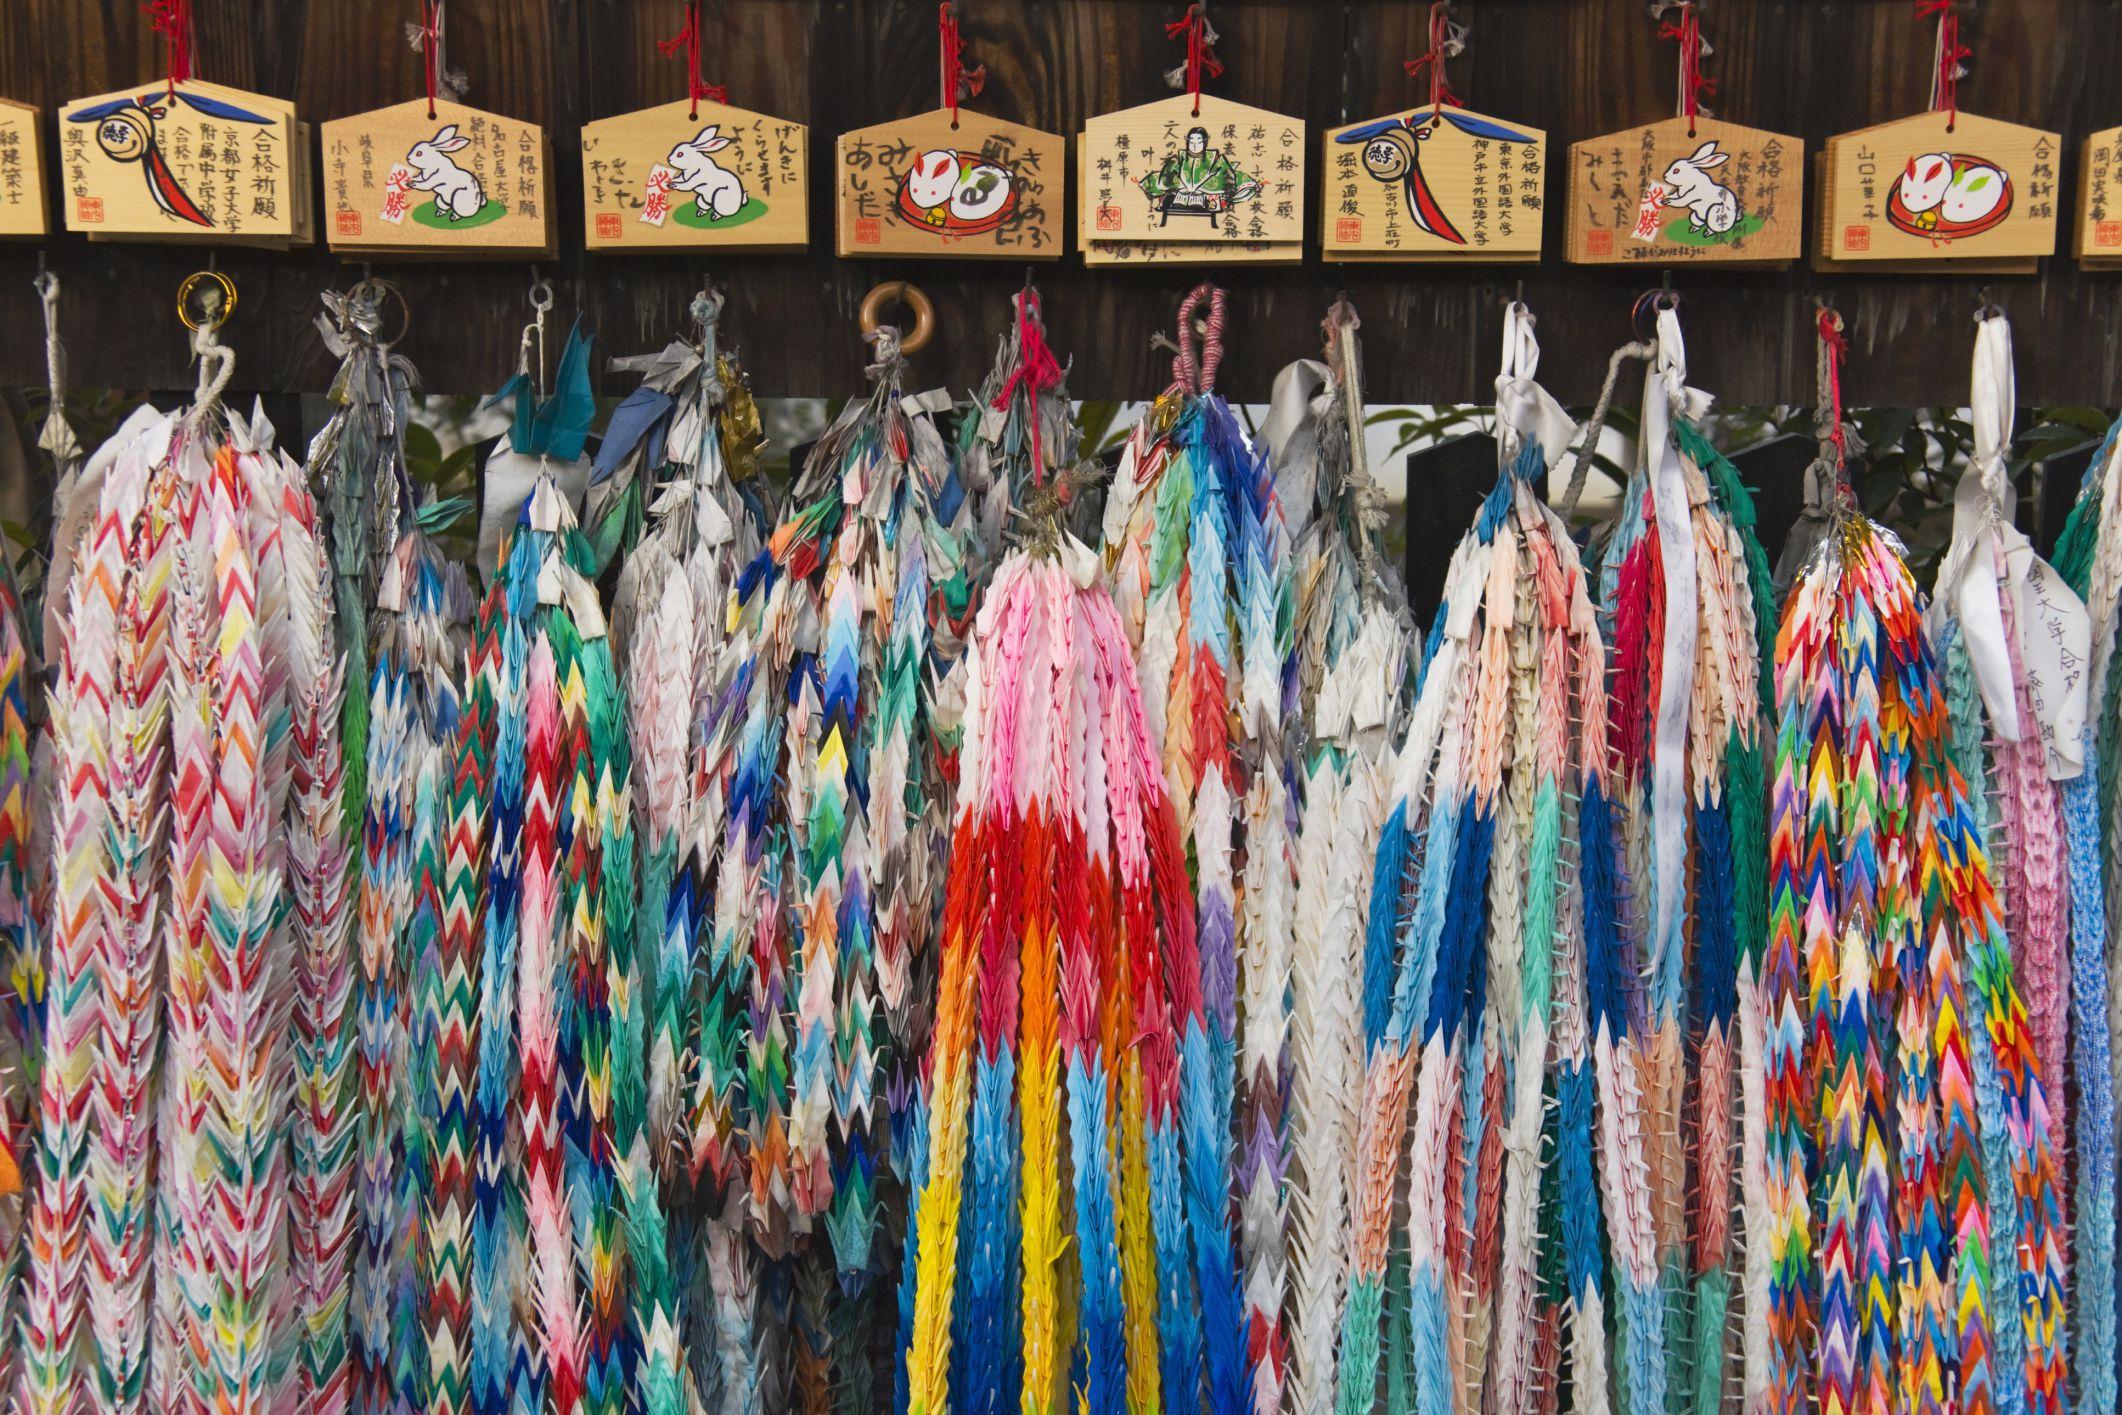 1 000 Paper Cranes What Does A Senbazuru Mean